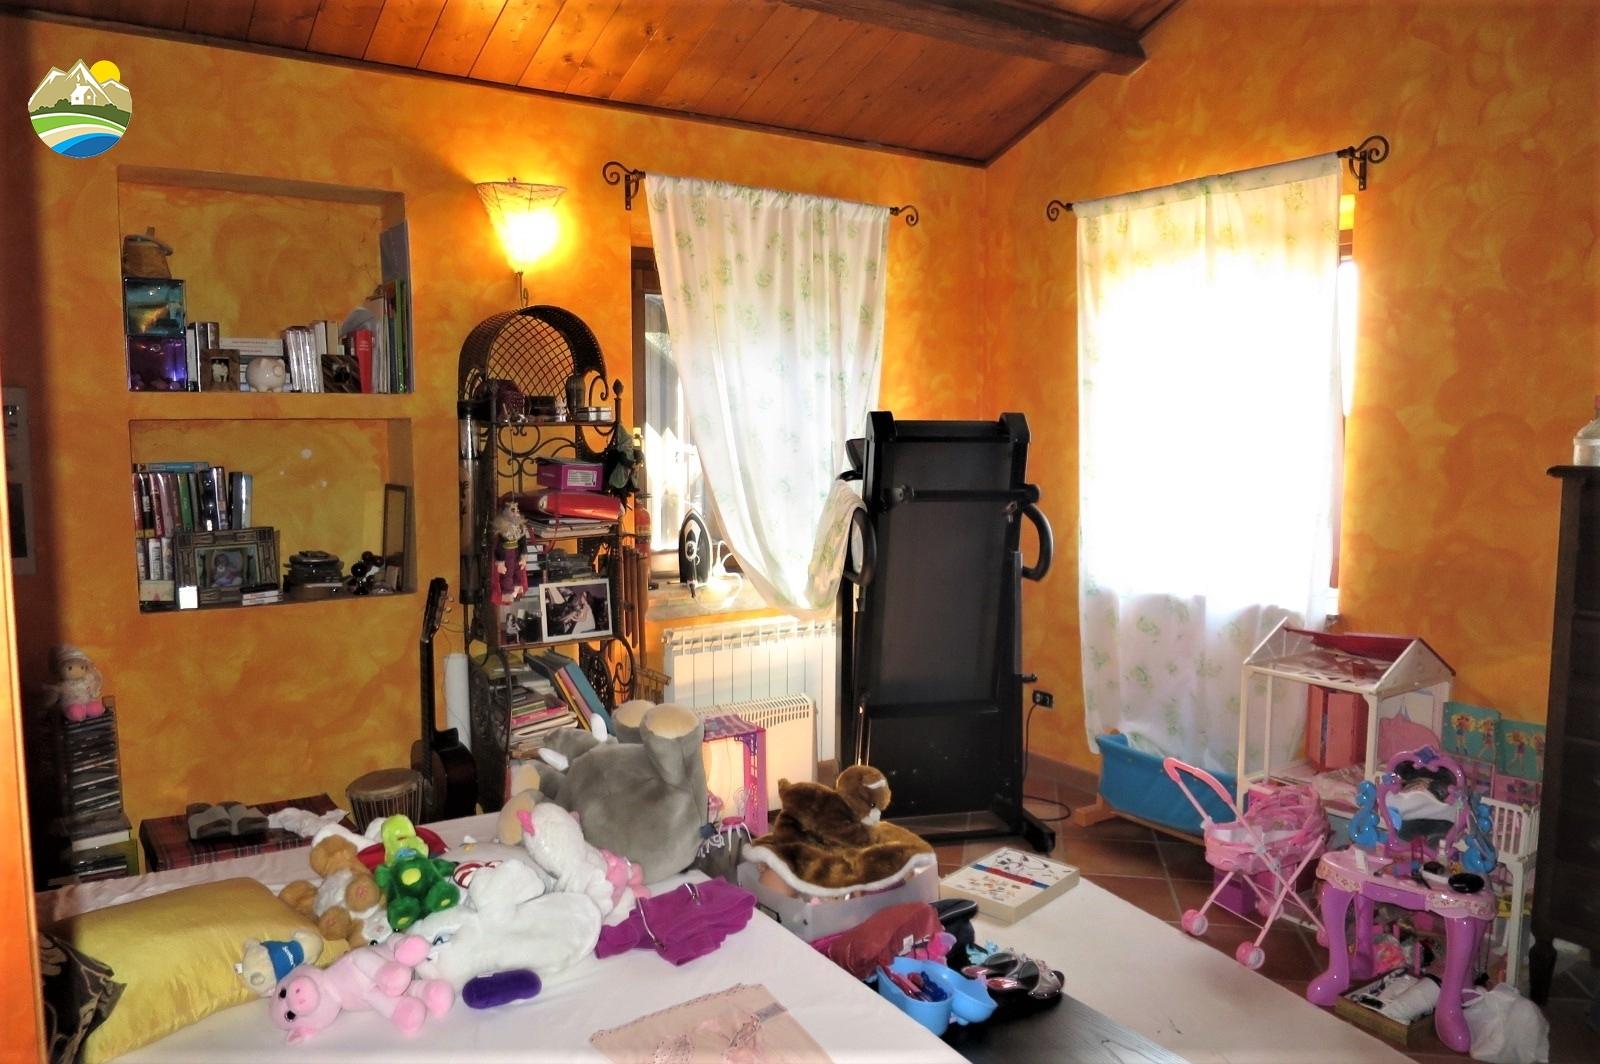 Country Houses Country Houses for sale Morro D'Oro (TE), Casa del Moro - Morro D'Oro - EUR 327.141 580